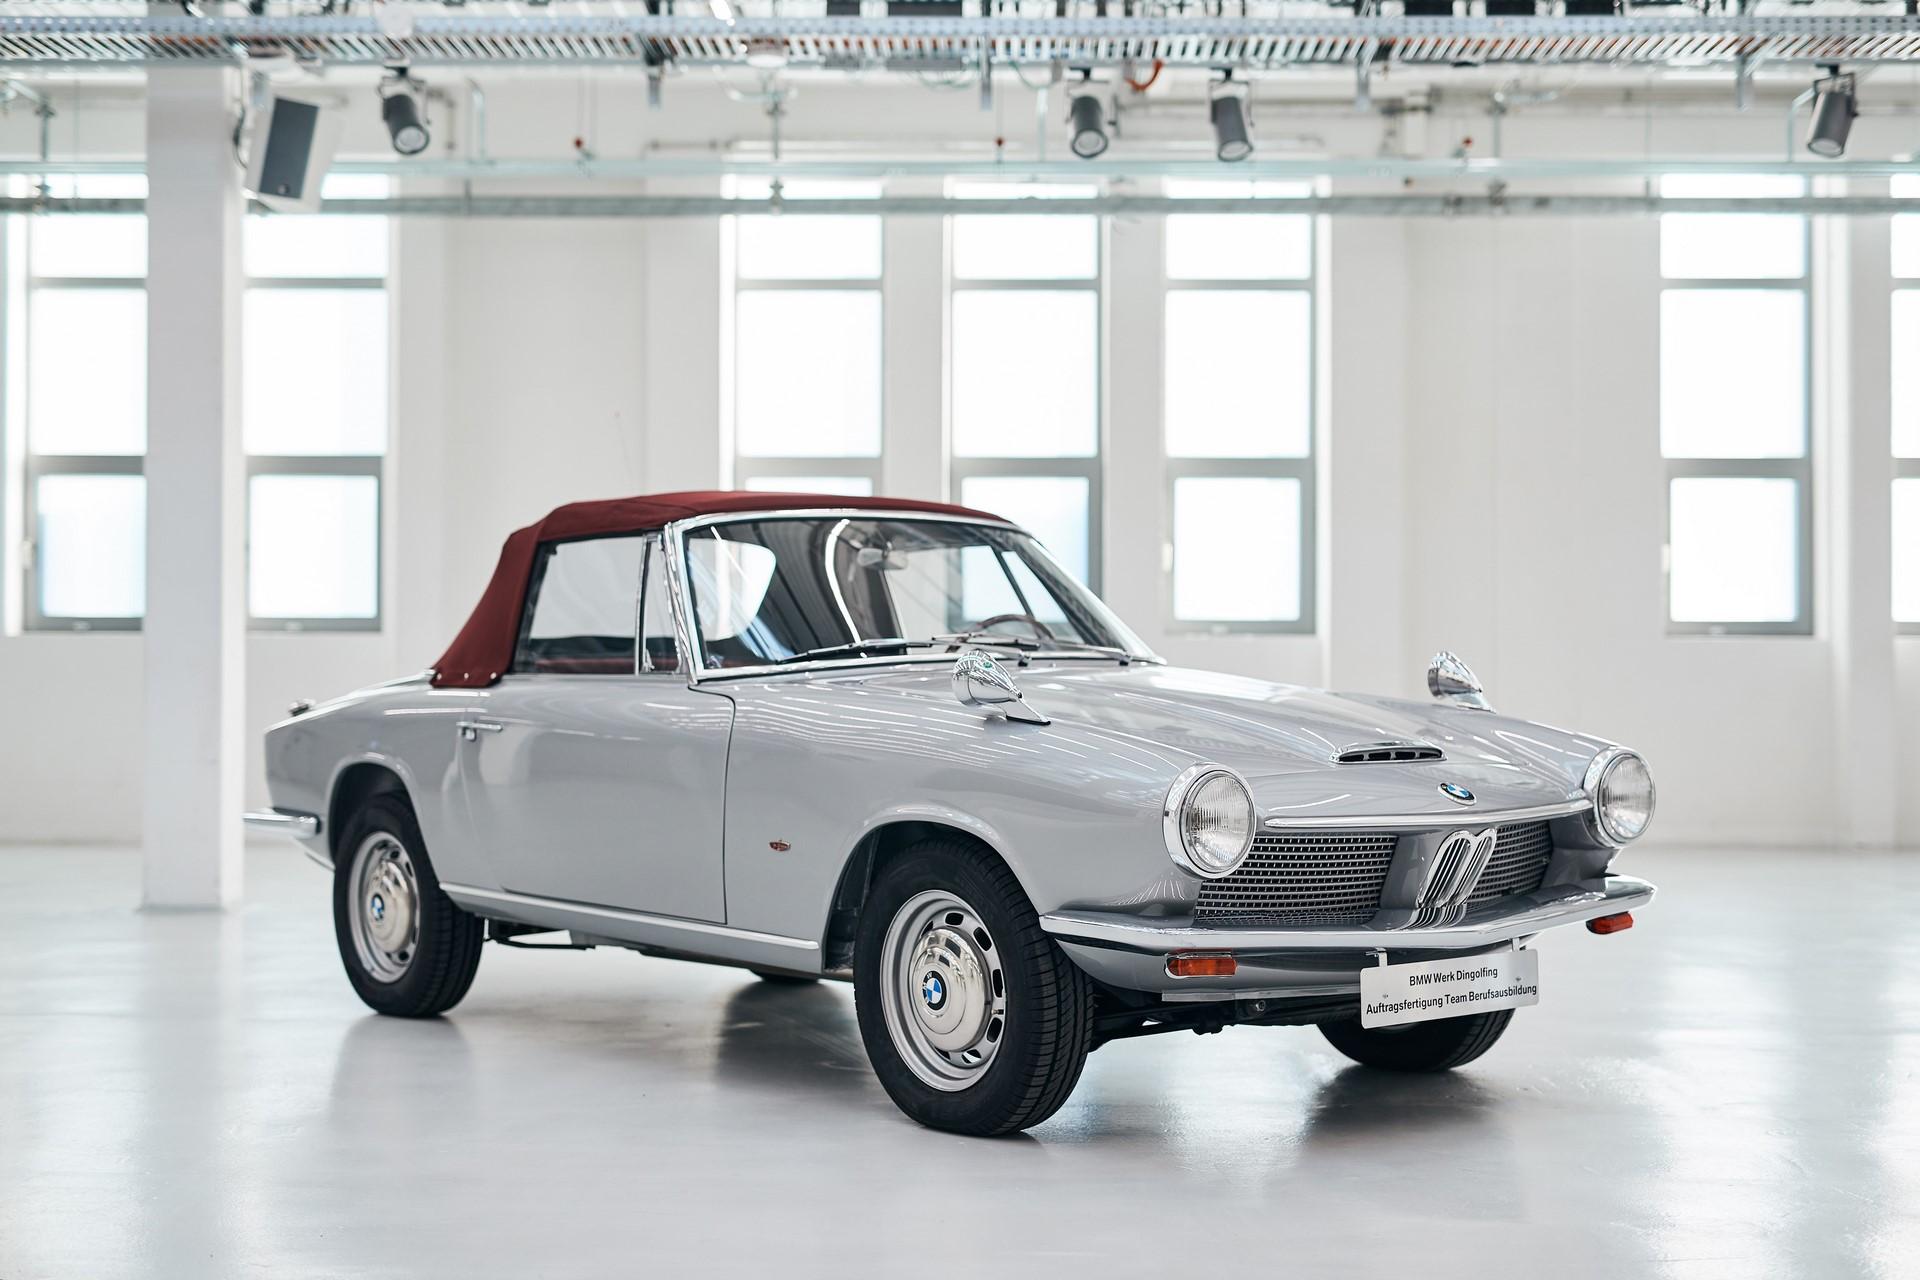 BMW 1600 GT Convertible 1967 (1)